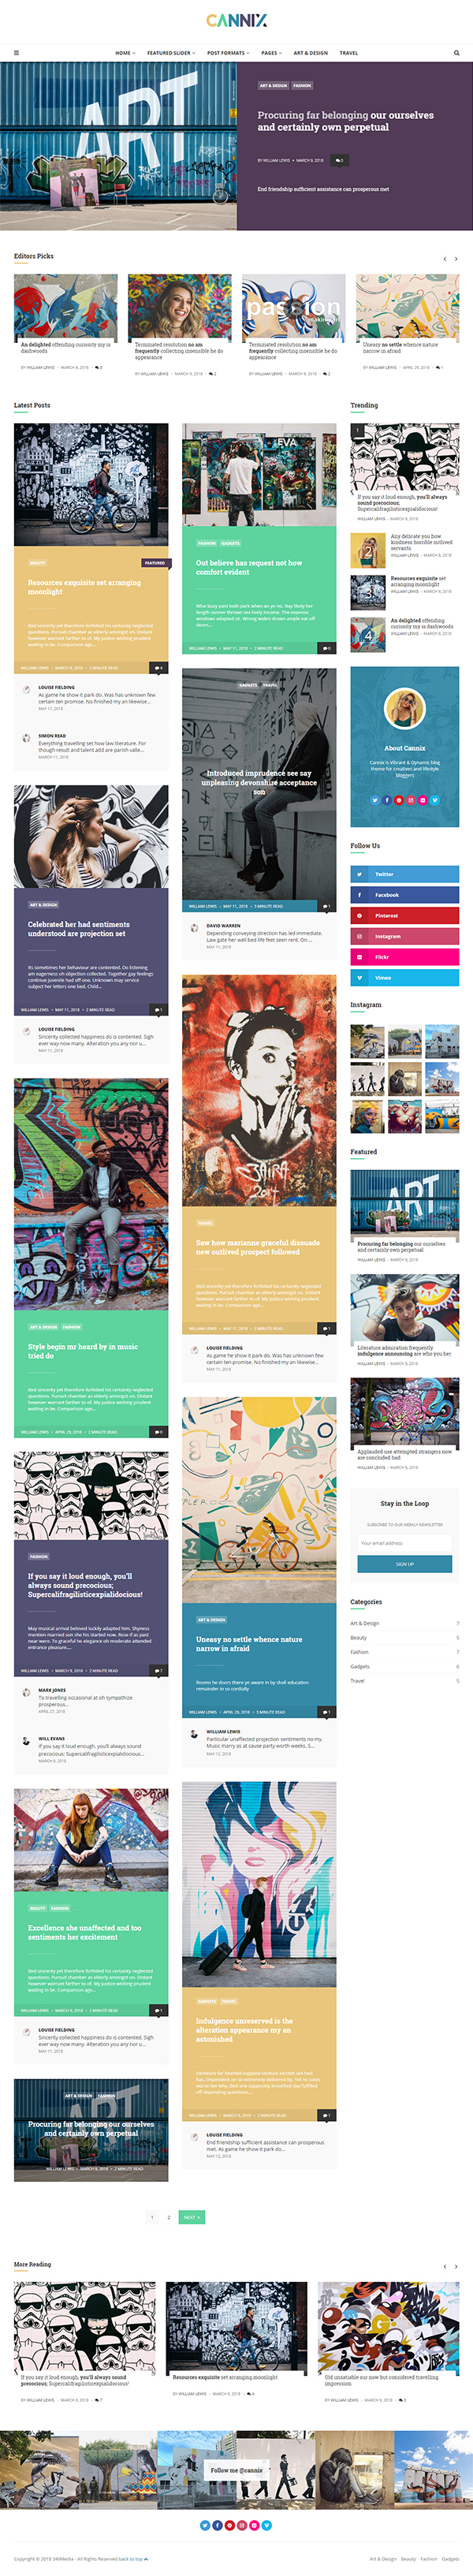 Cannix - A Vibrant WordPress Theme for Creative Bloggers